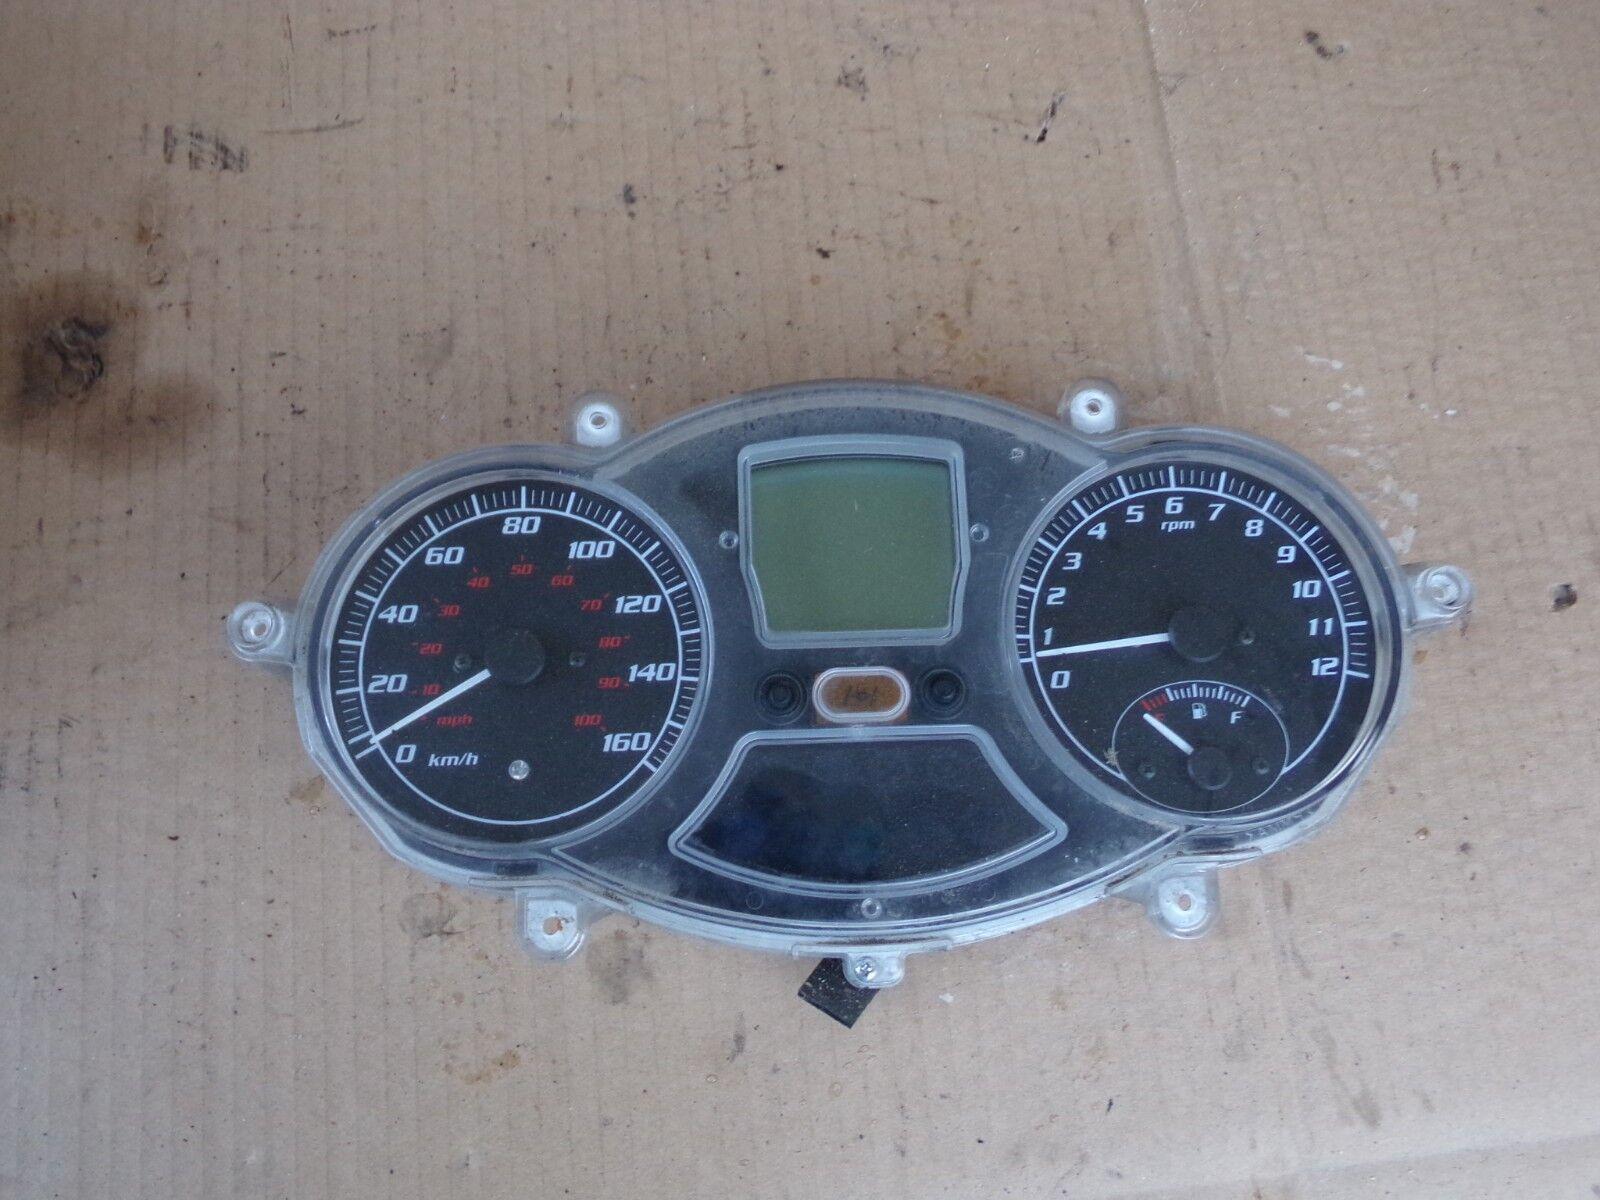 Compteur de vitesse piaggio mp3 125 2003 2009